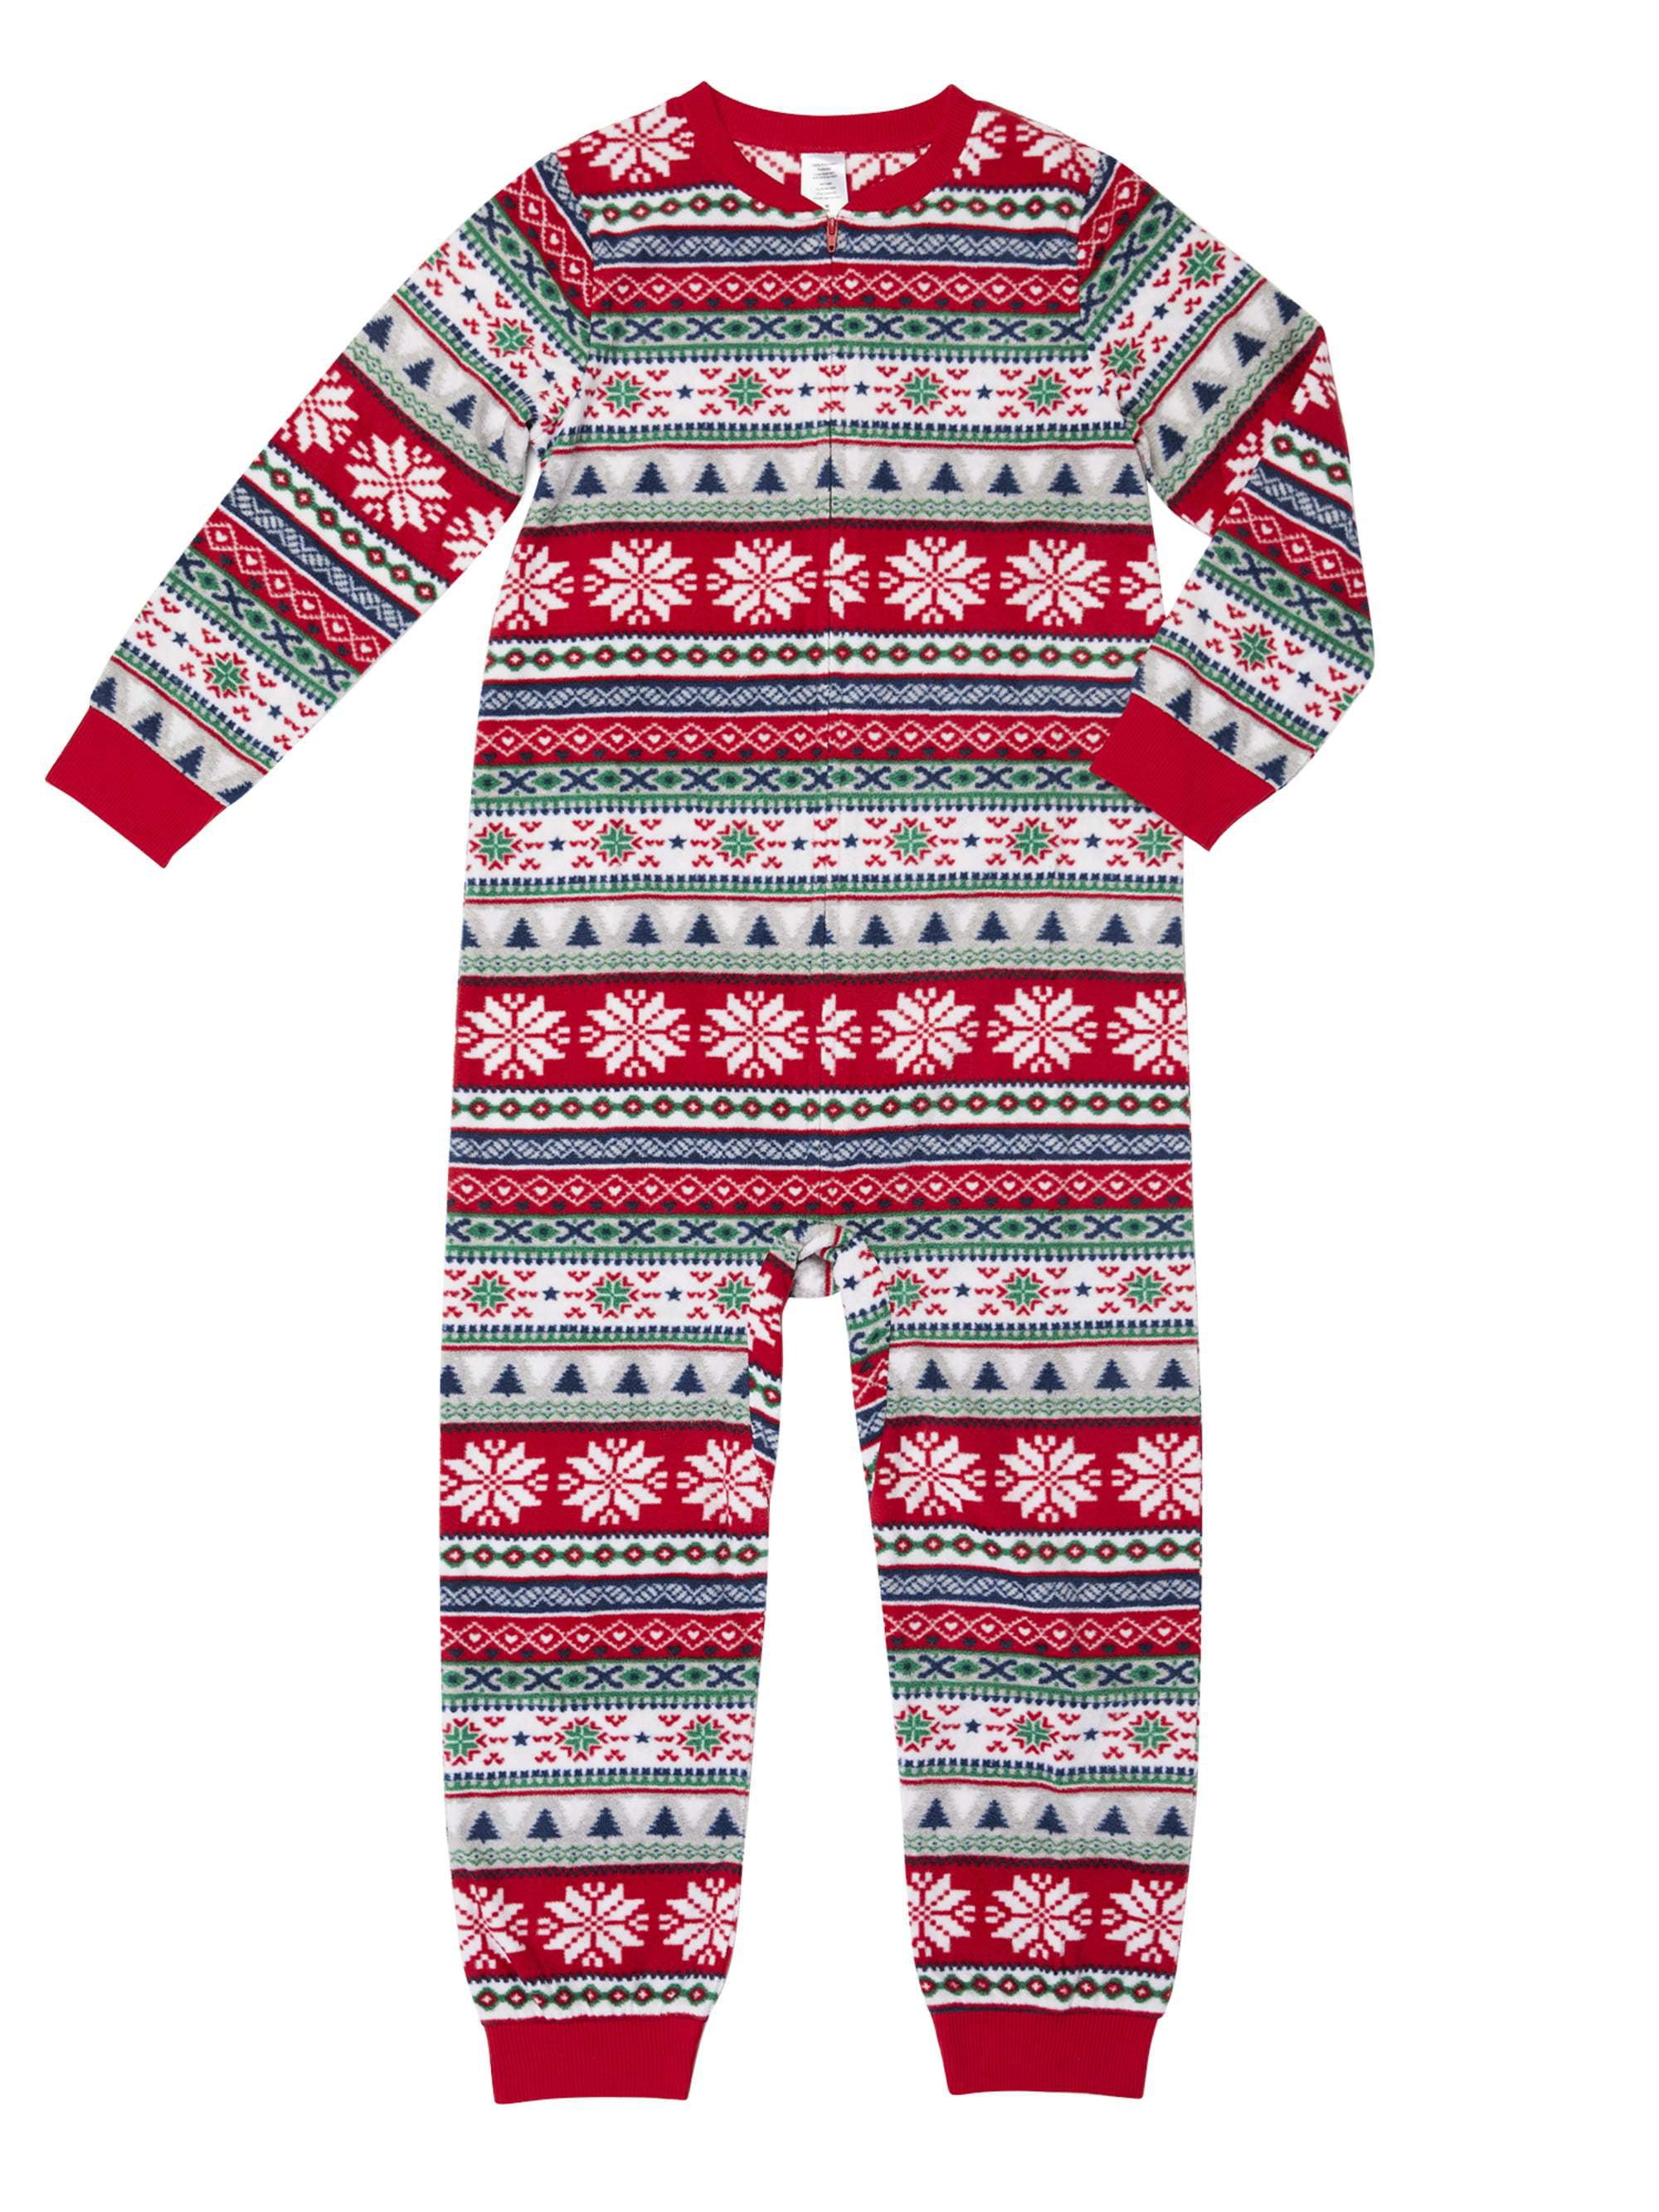 7463ecb0f8e2 Family PJs Family Sleep Merry Everything Unionsuit Pajama (Boys or ...